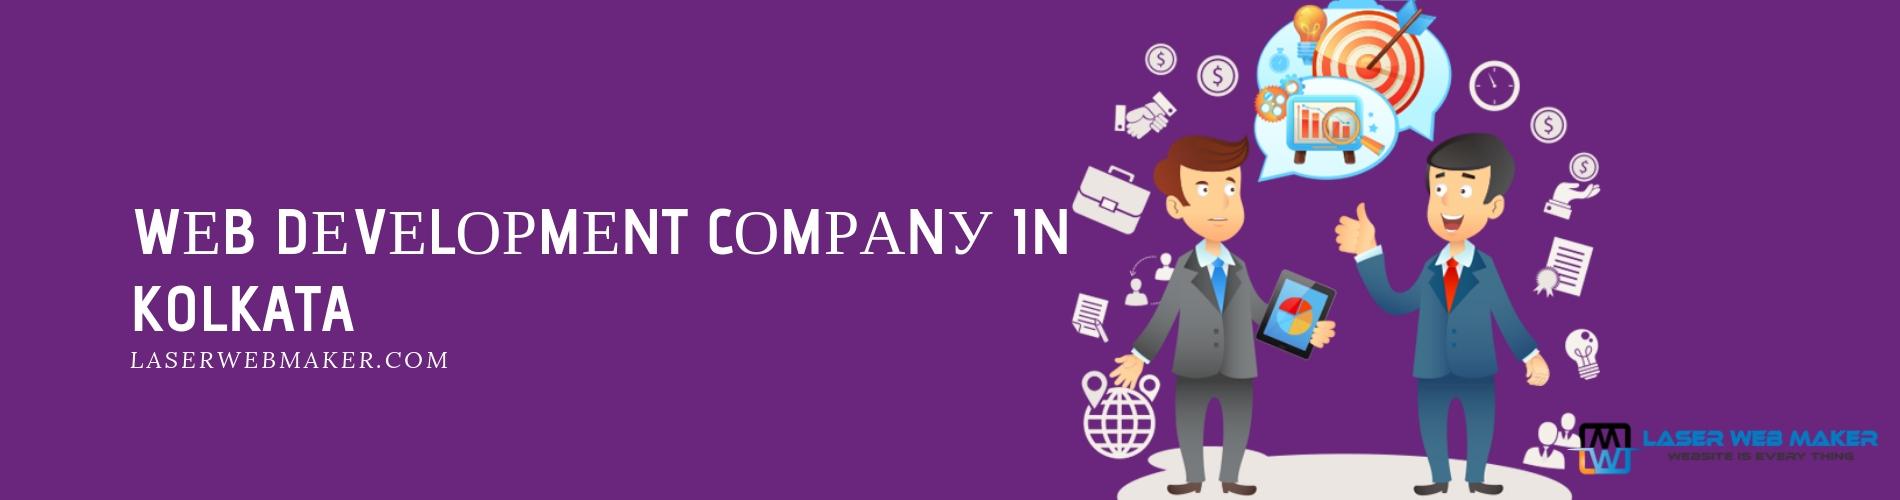 web development company in kolkata